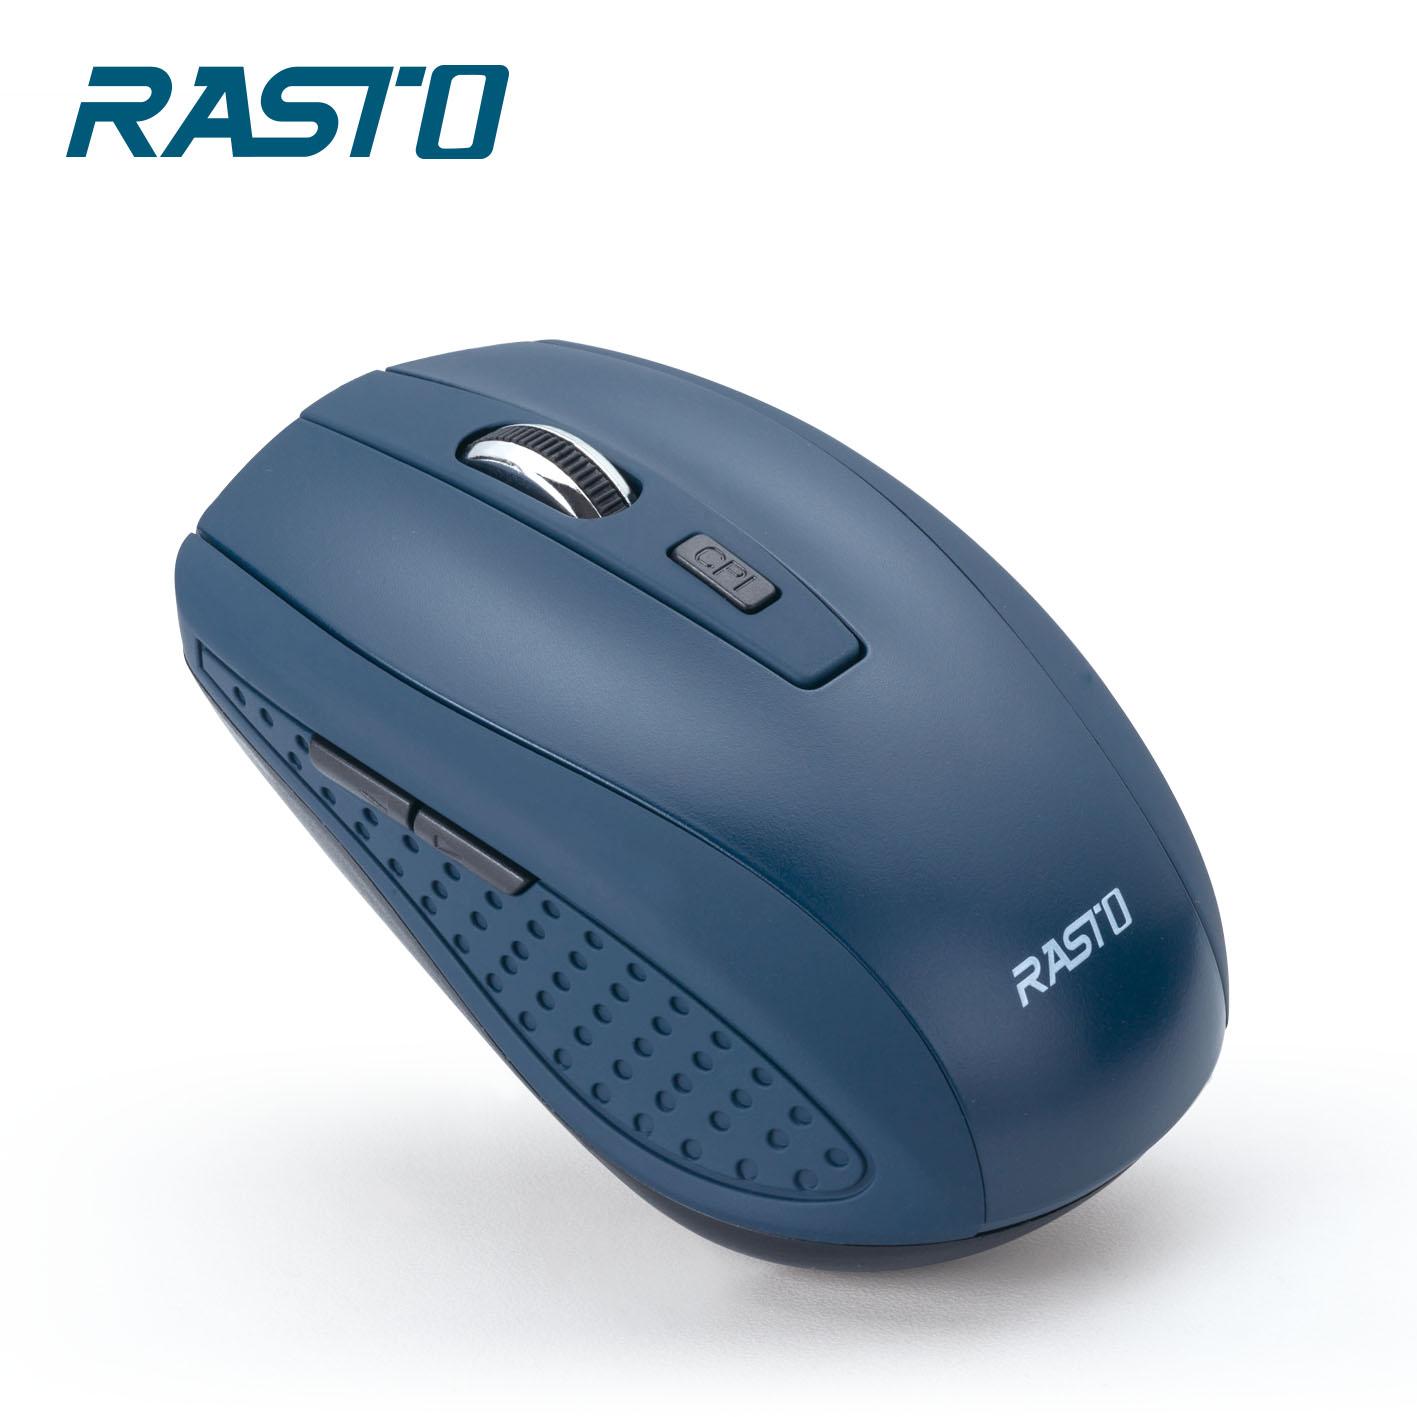 RASTO RM6 六鍵式超靜音無線滑鼠